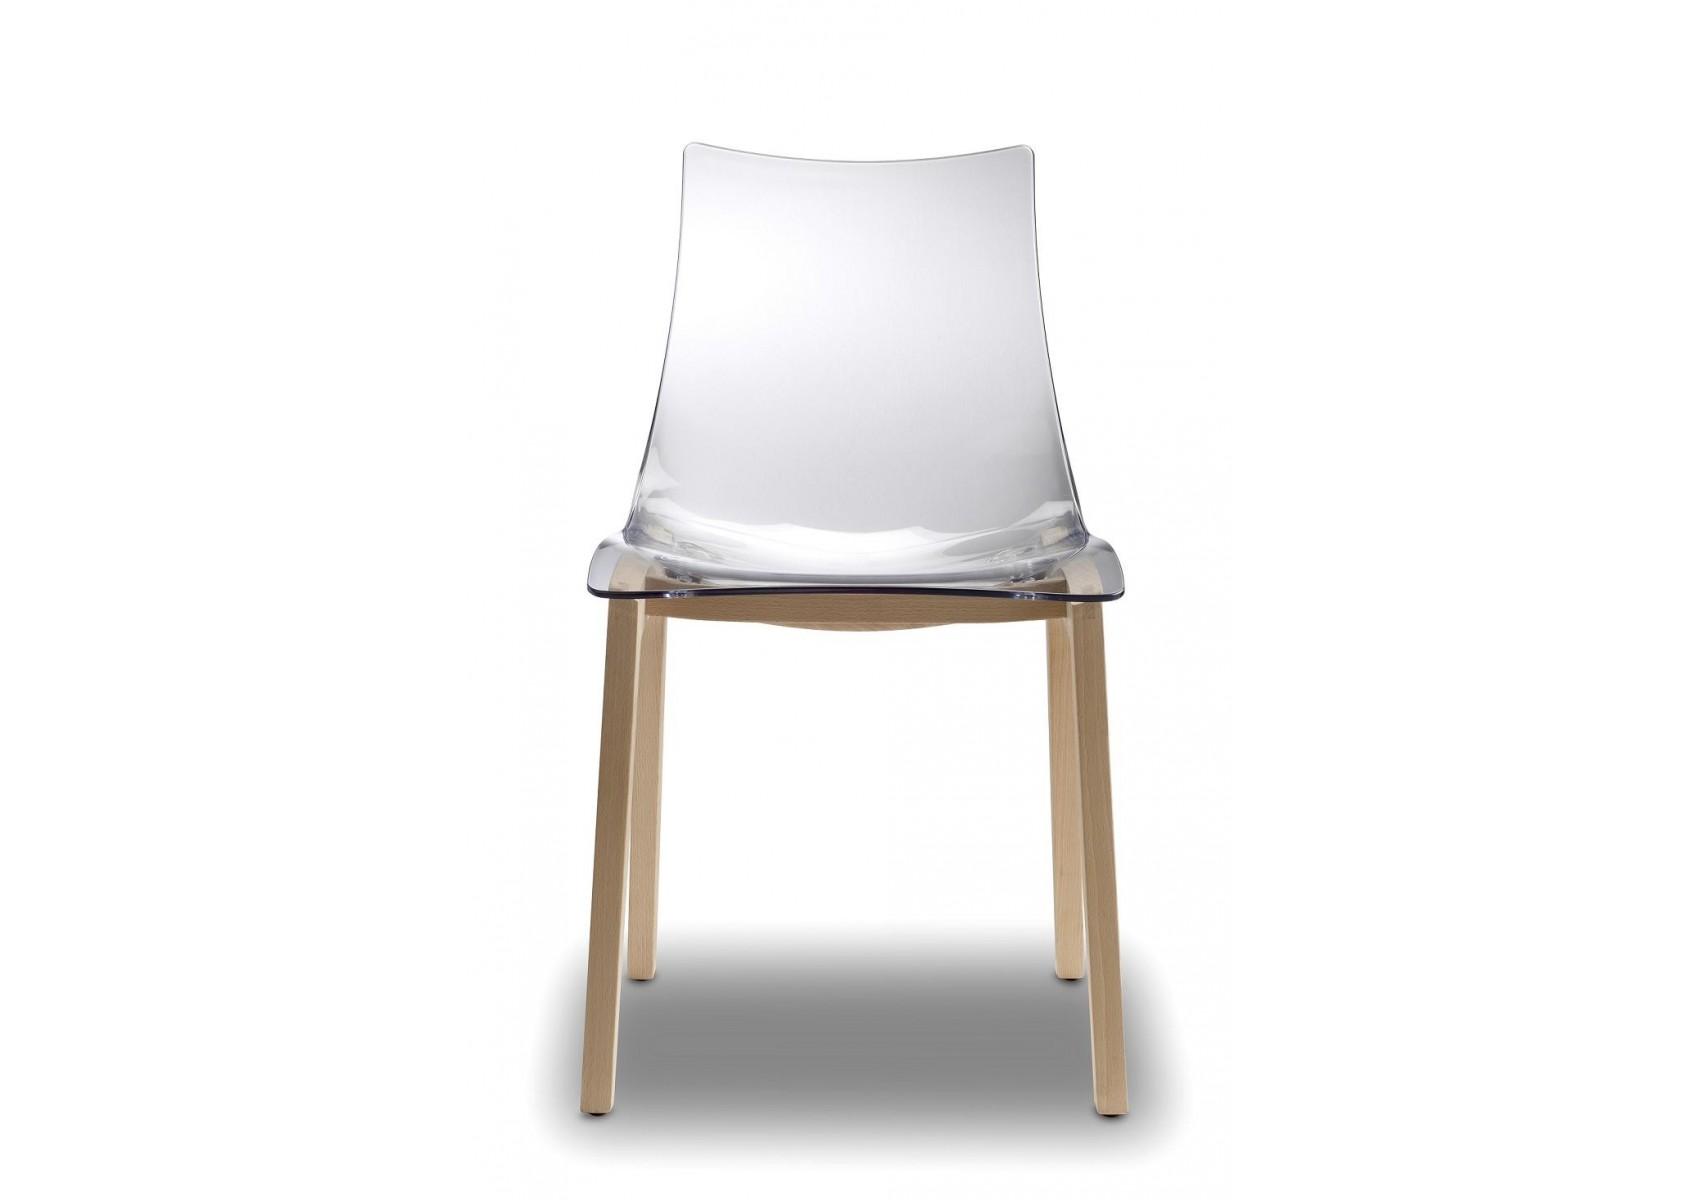 Chaise transparente design natural zebra par scab design - Chaise transparente design ...